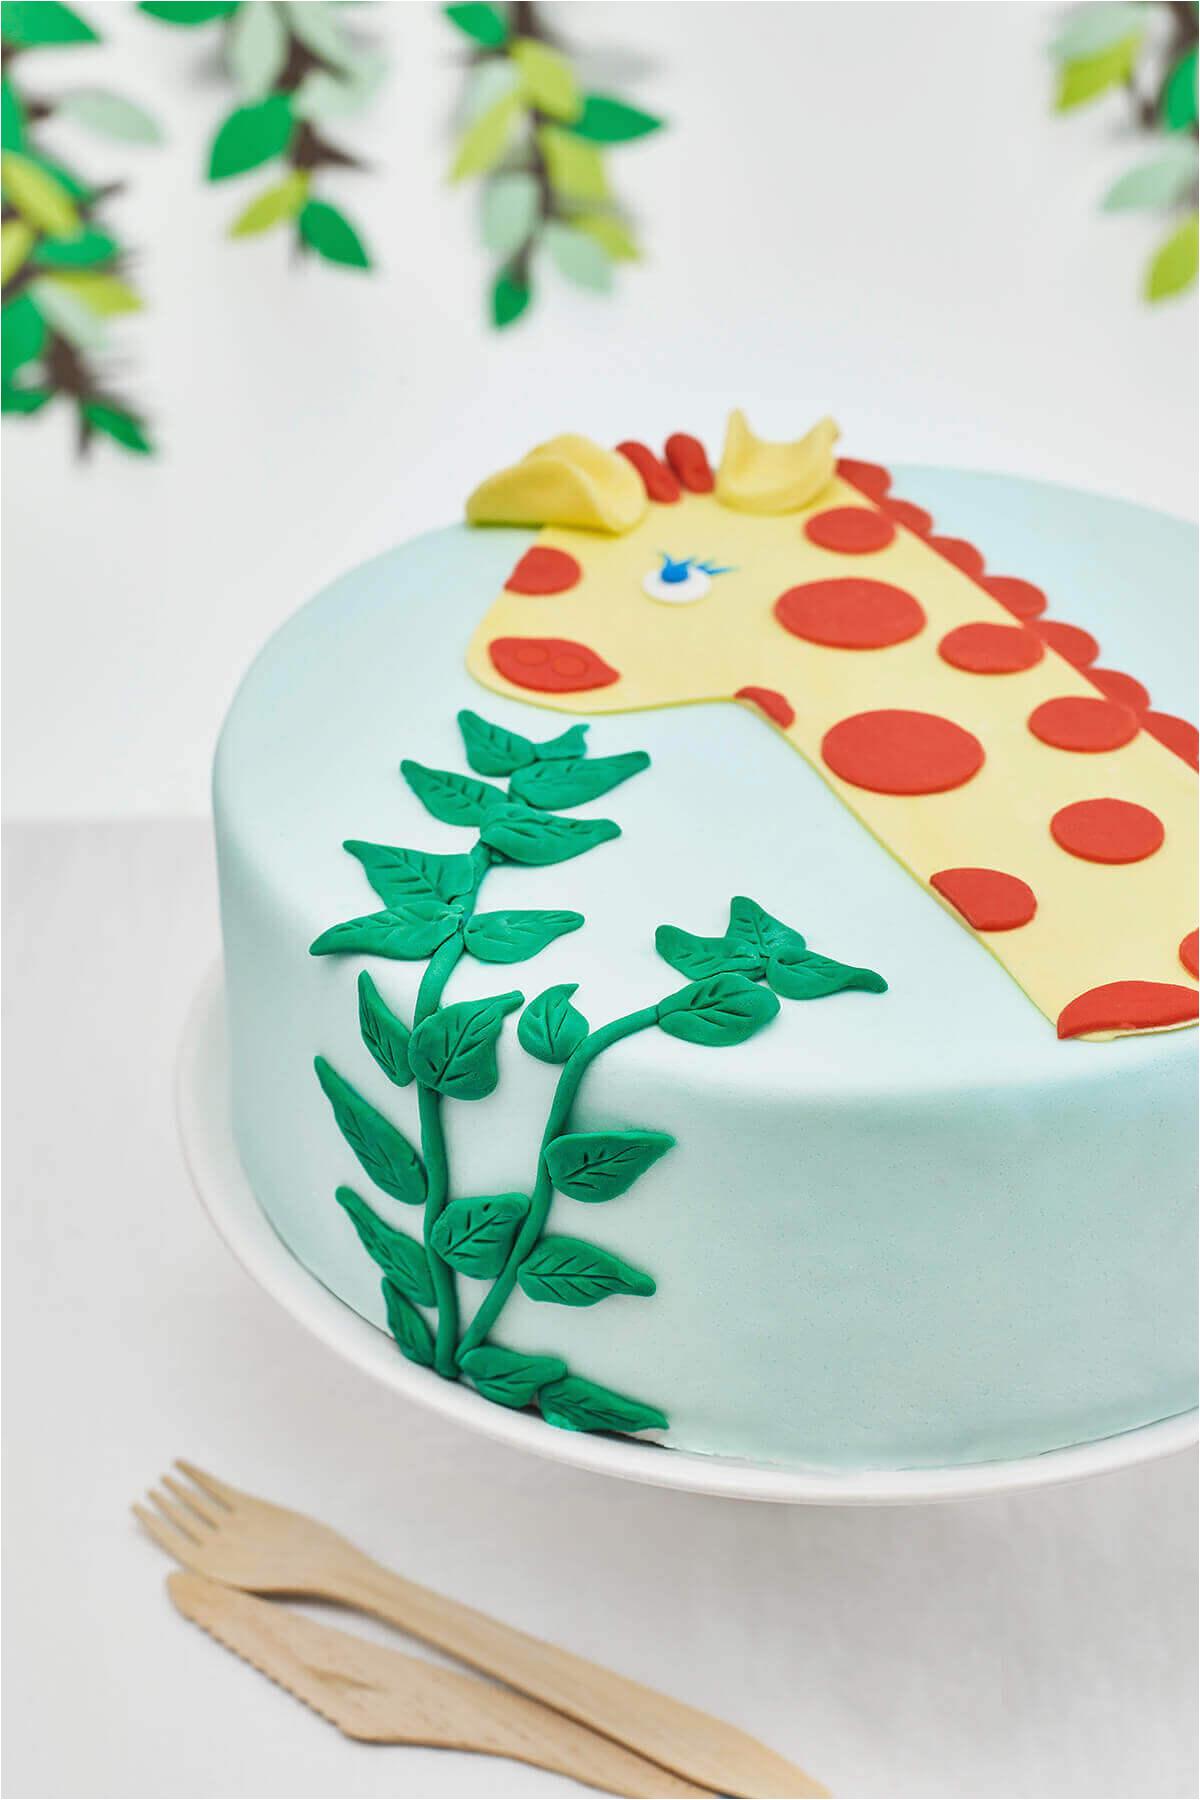 Birthday Cake Decorating Kits One Year Old Giraffe Themed Diy